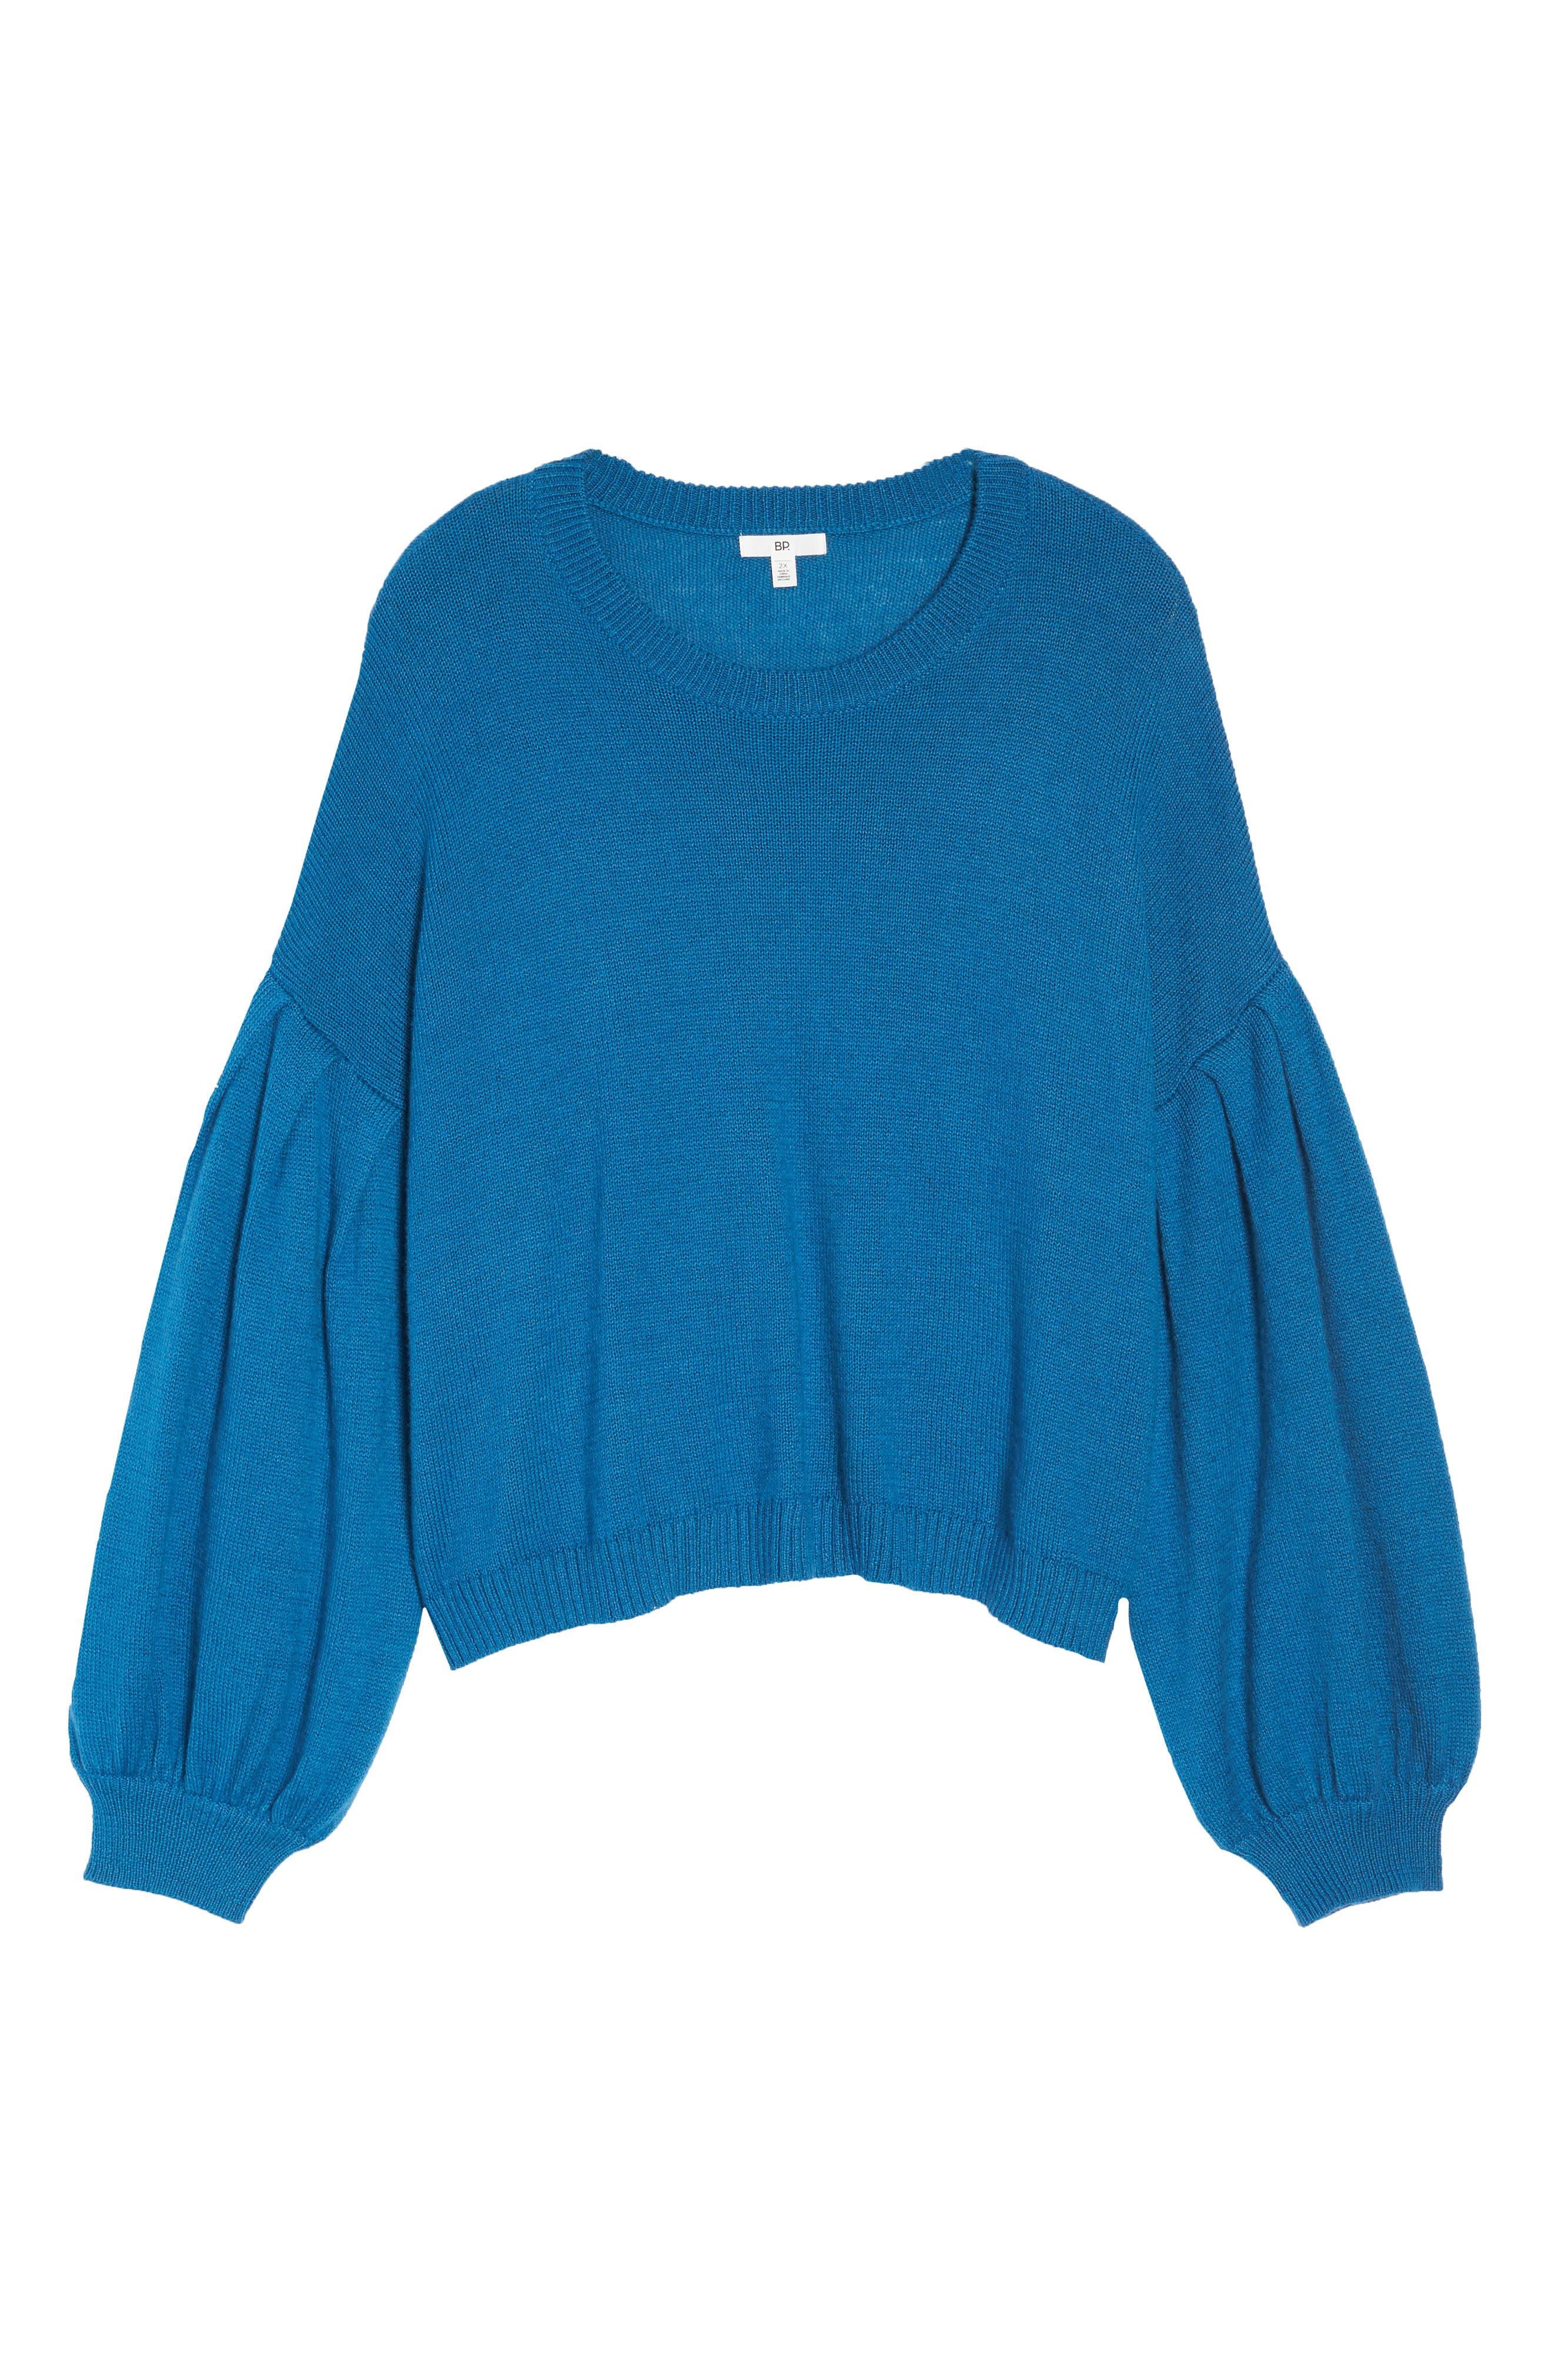 Blouson Sleeve Sweater,                             Alternate thumbnail 11, color,                             TEAL SAPPHIRE